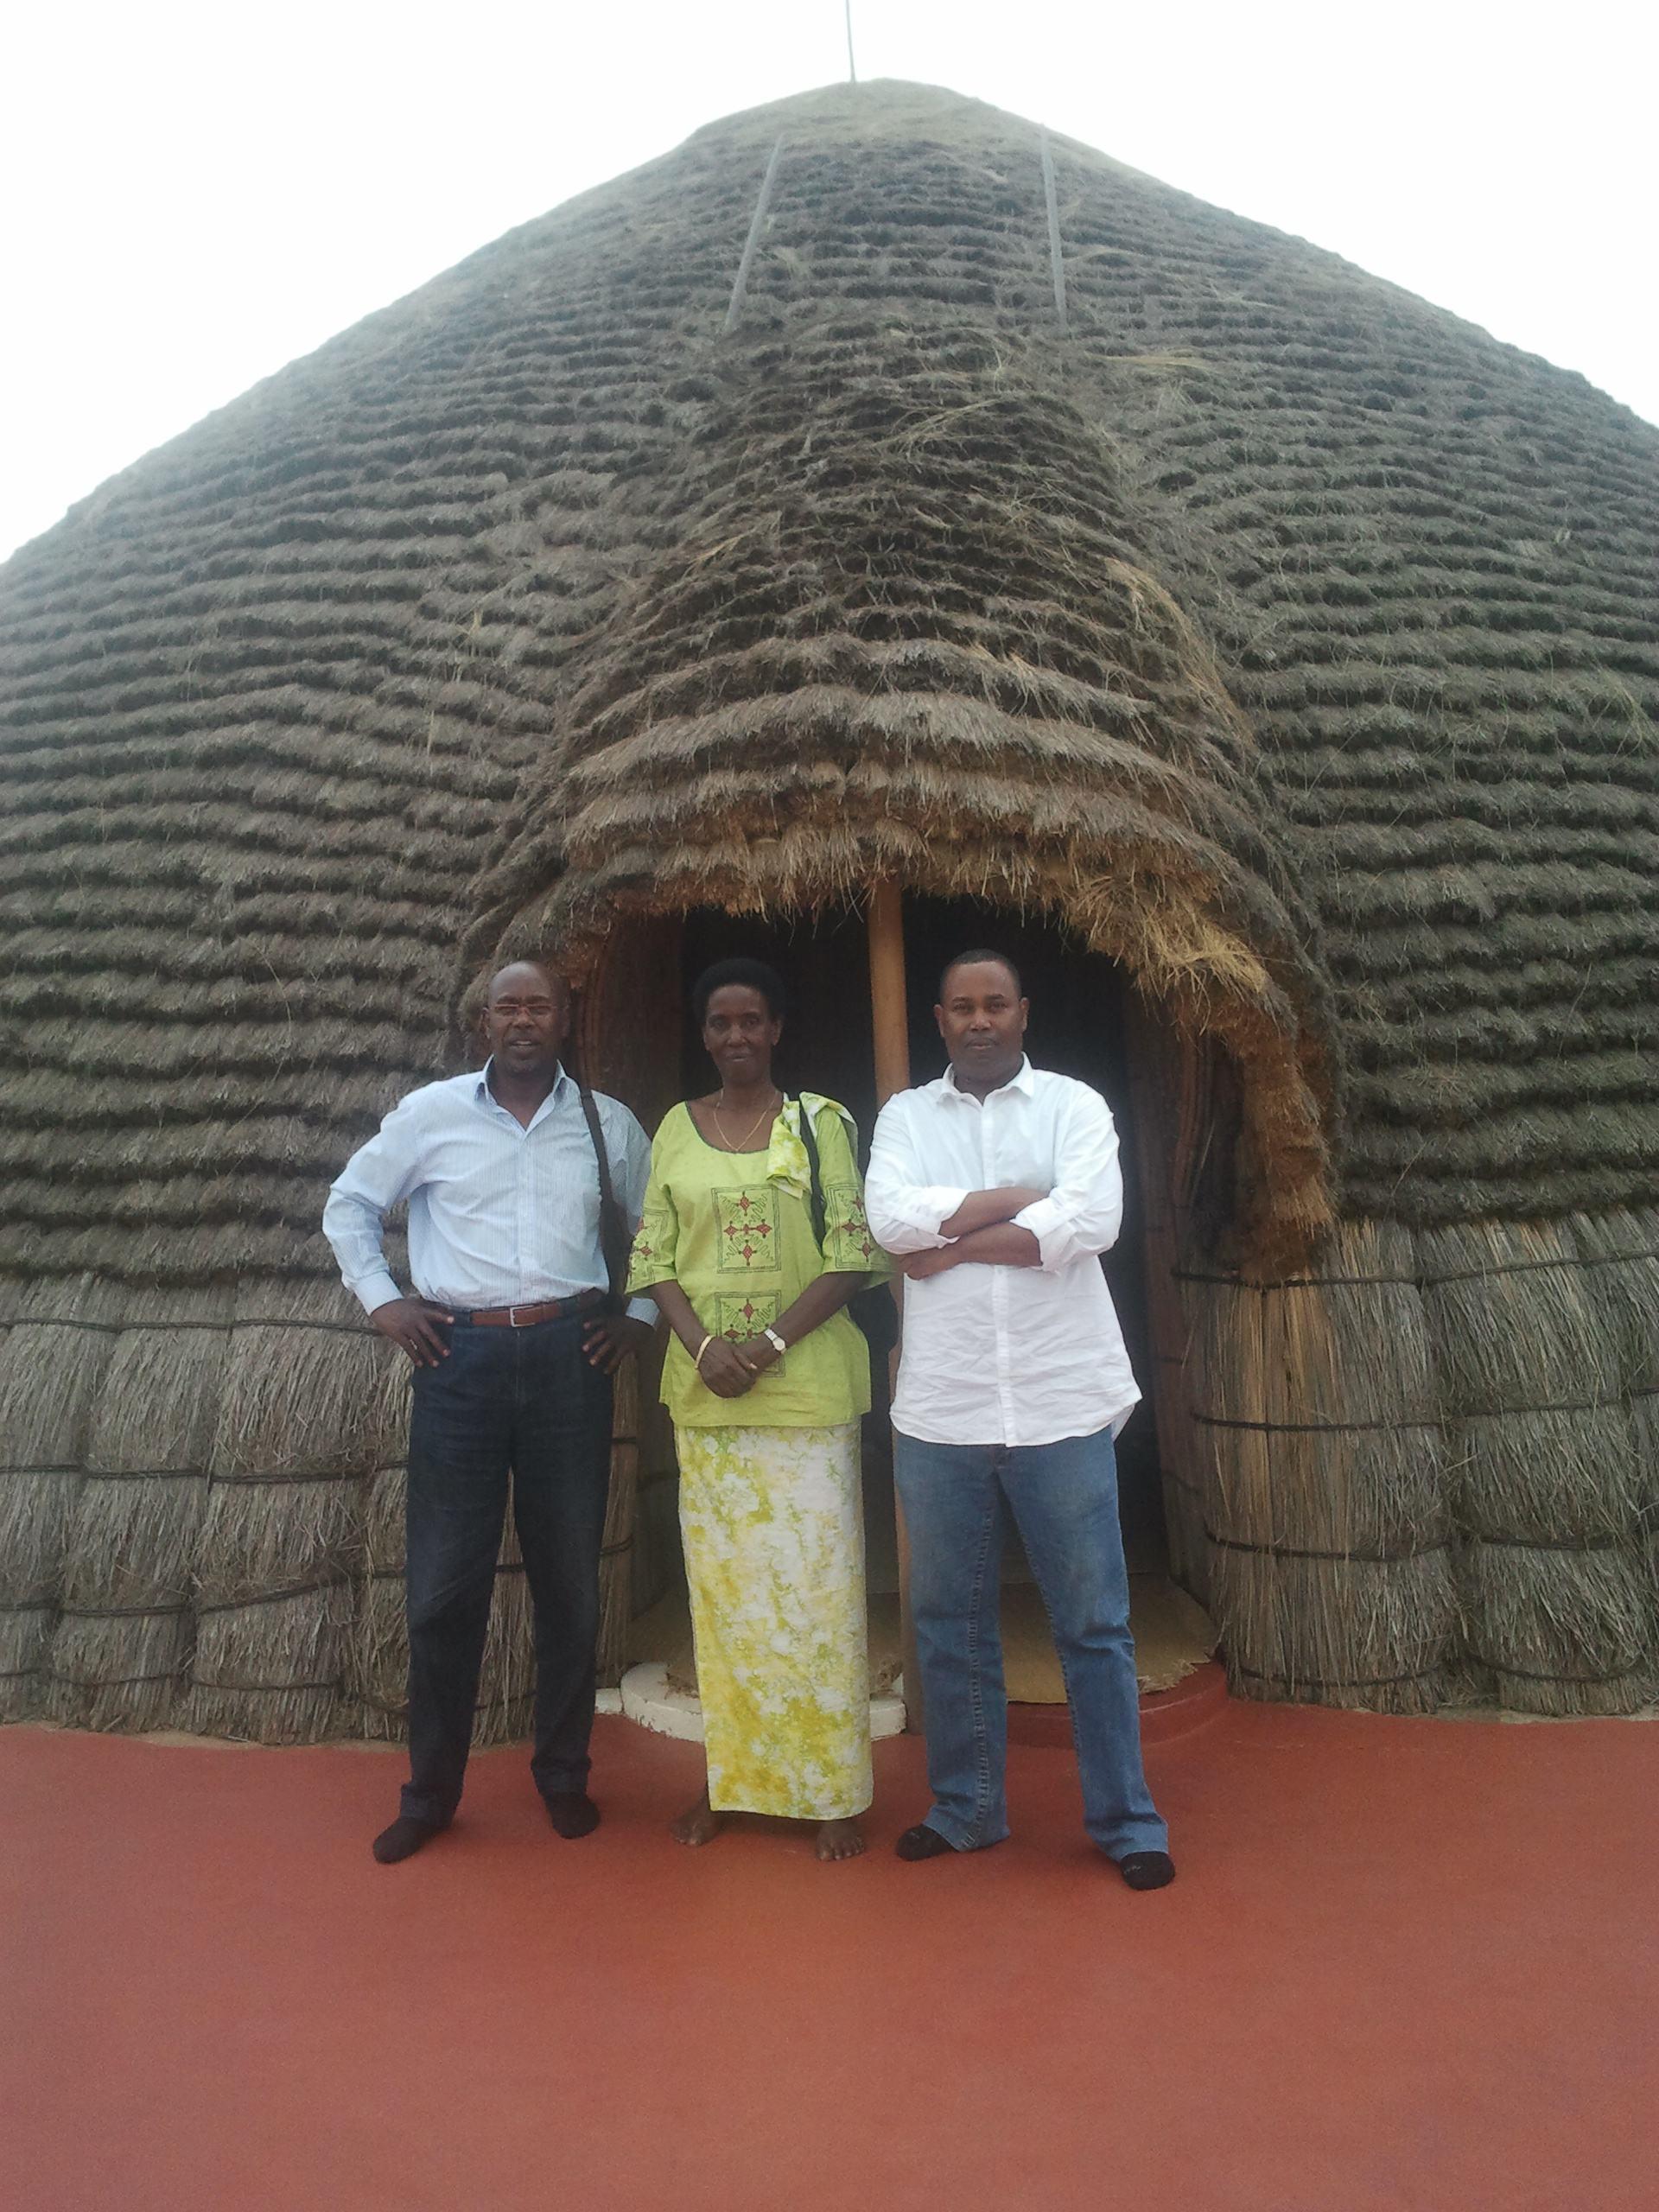 RWANDA: Le Tourisme en Plein Essor